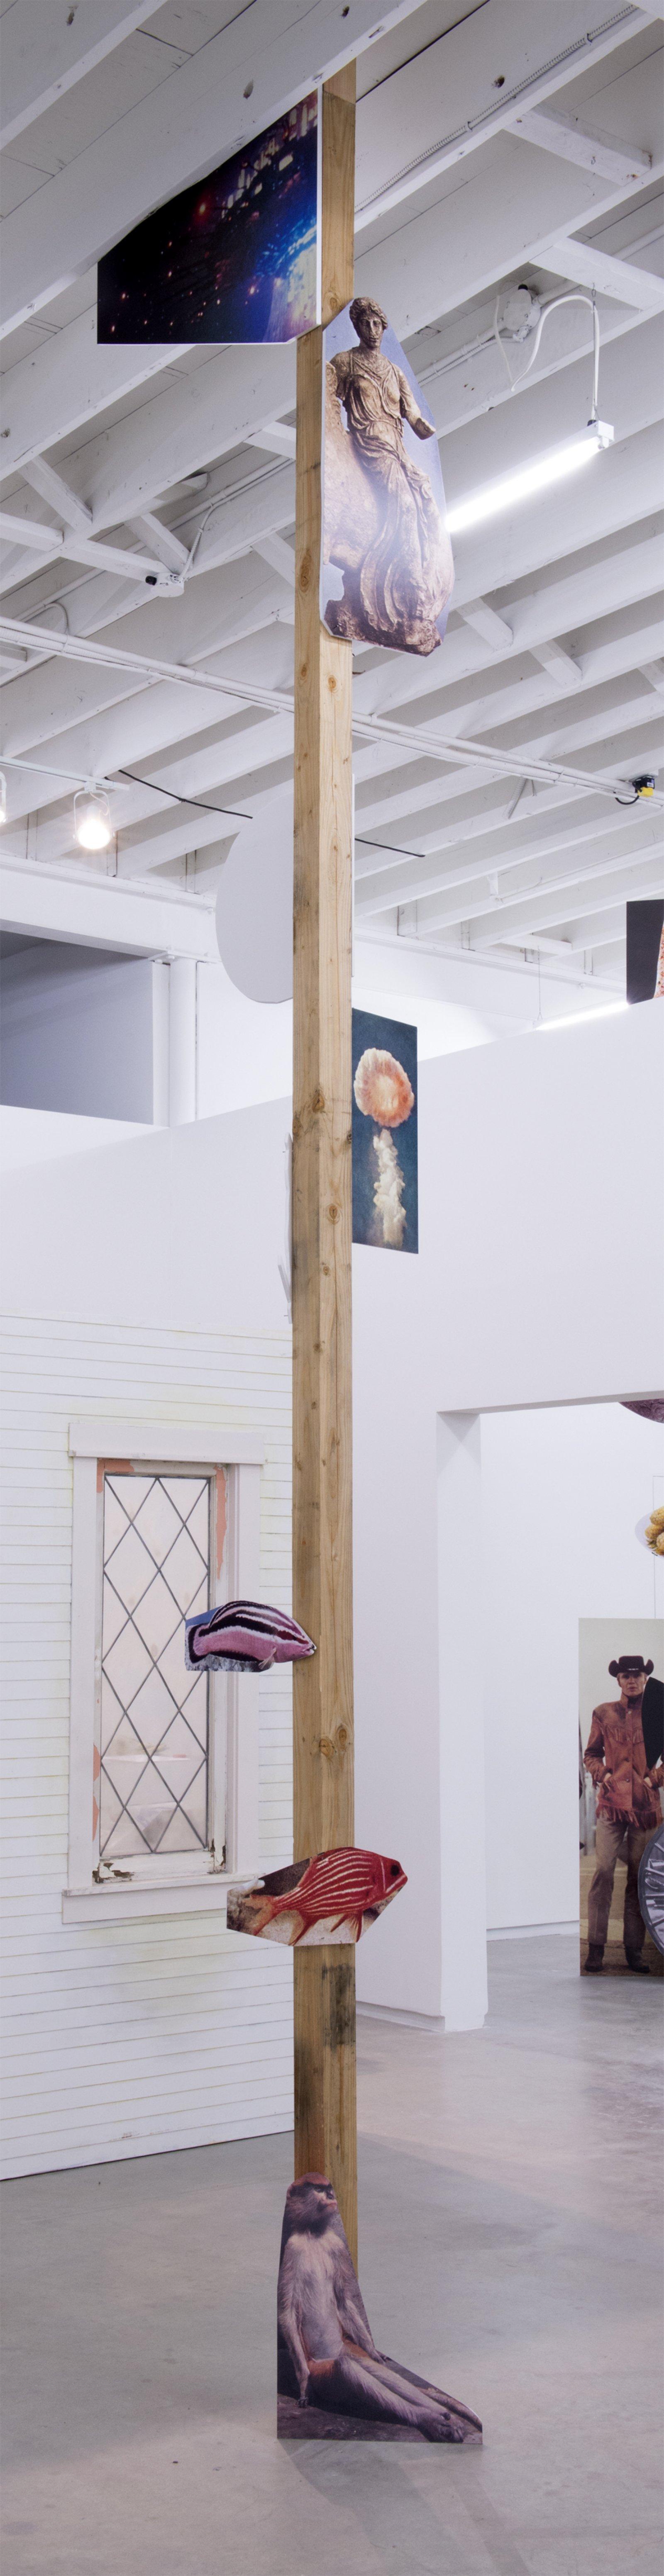 Geoffrey Farmer, Dreams of the sleeping monkey., 2014, douglas fir pole, 10 photographs mounted on foamcore, 200 x 4 x 4 in. (508 x 9 x 9 cm) by Geoffrey Farmer